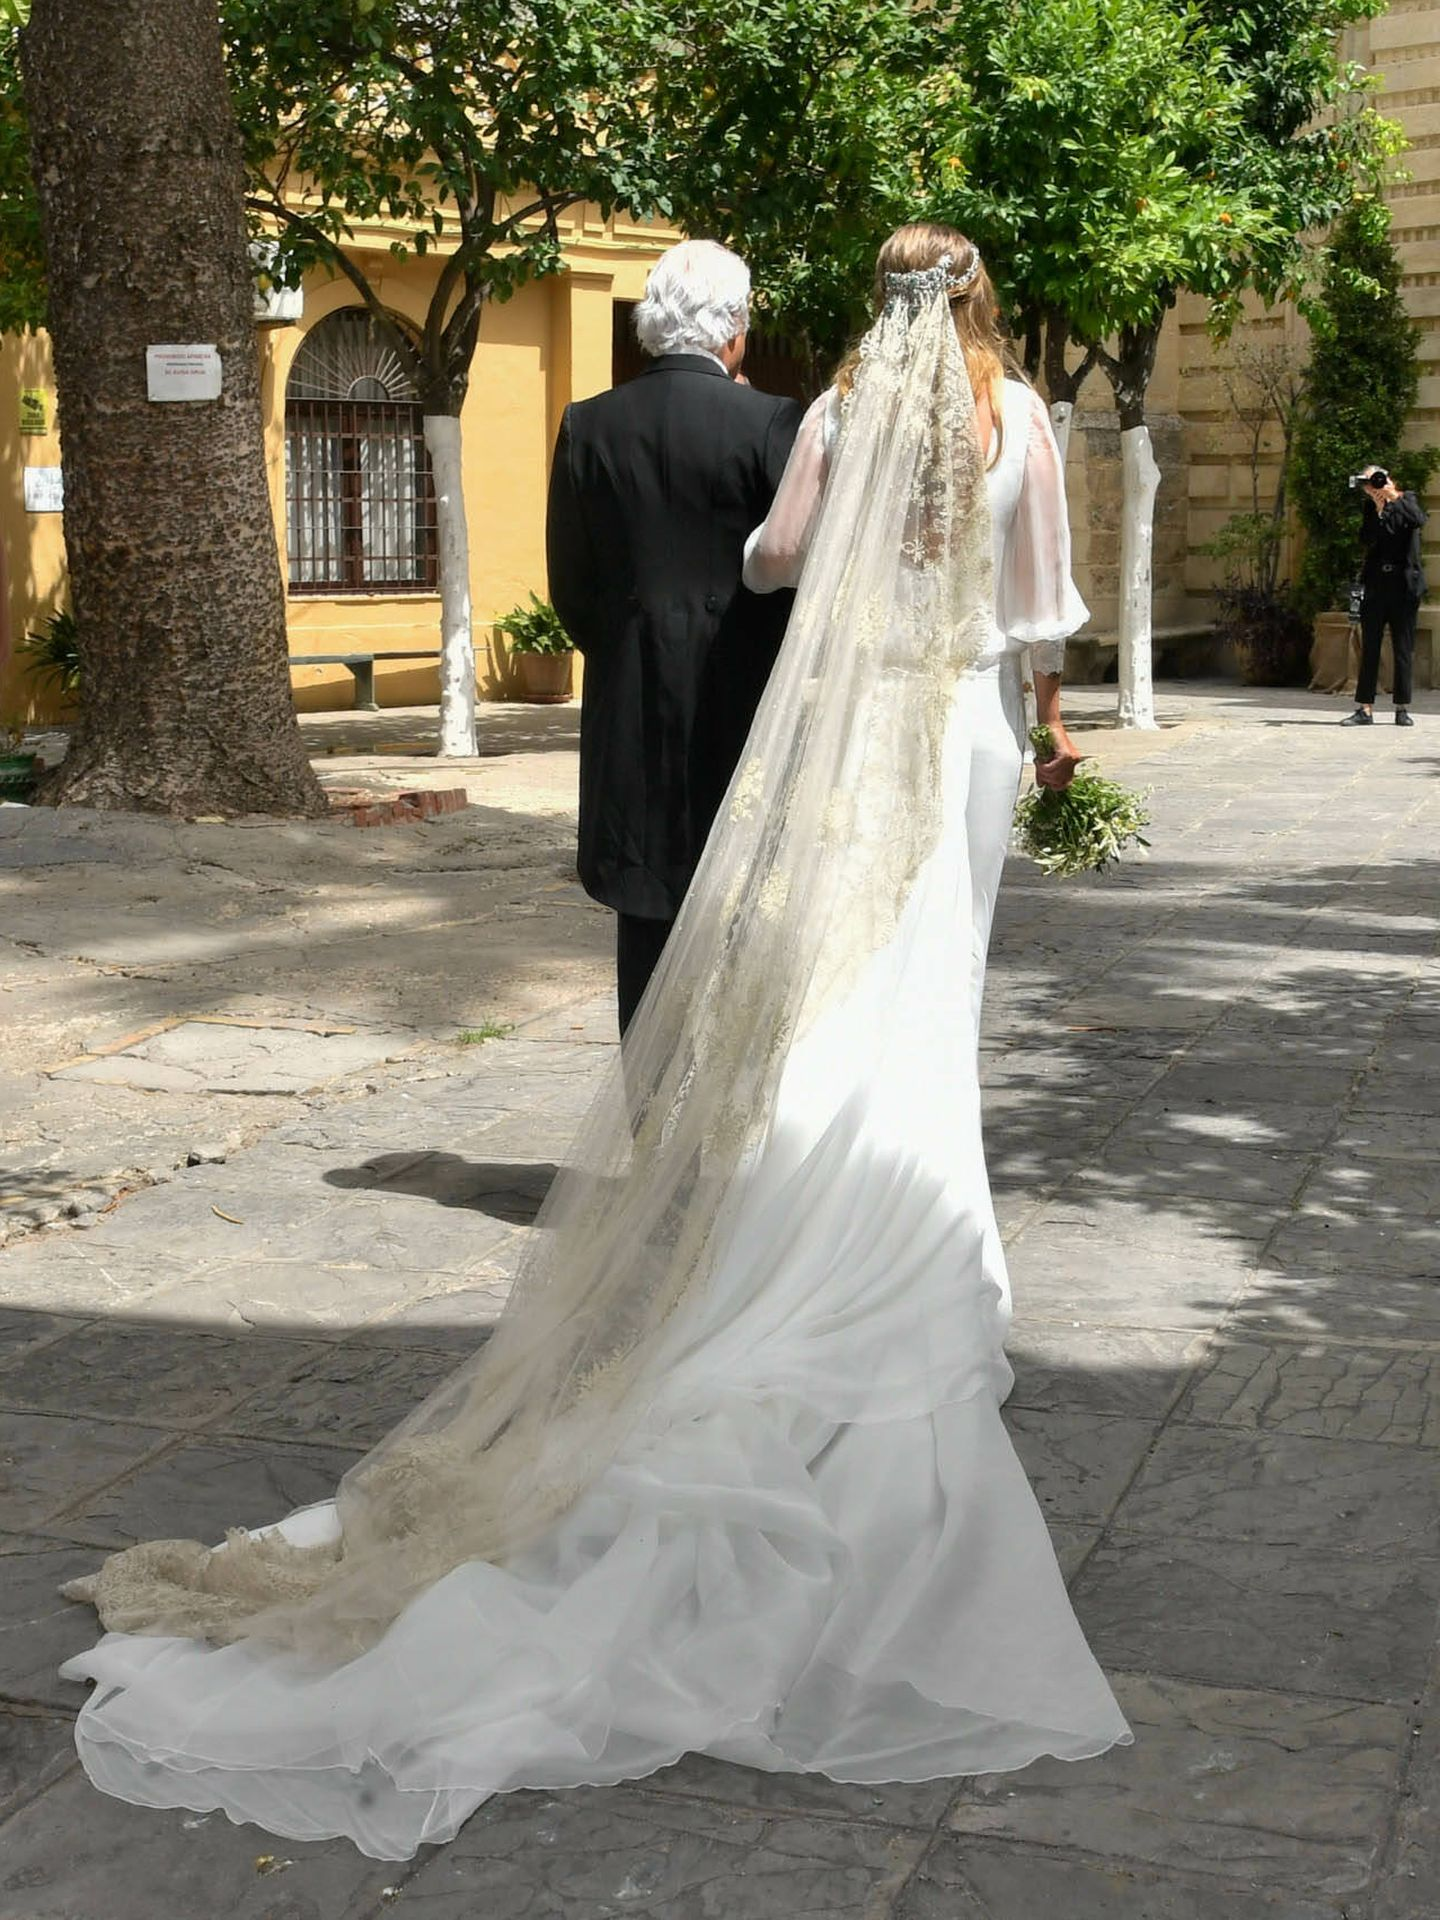 Ymelda Bilbao. (Gtresonline)